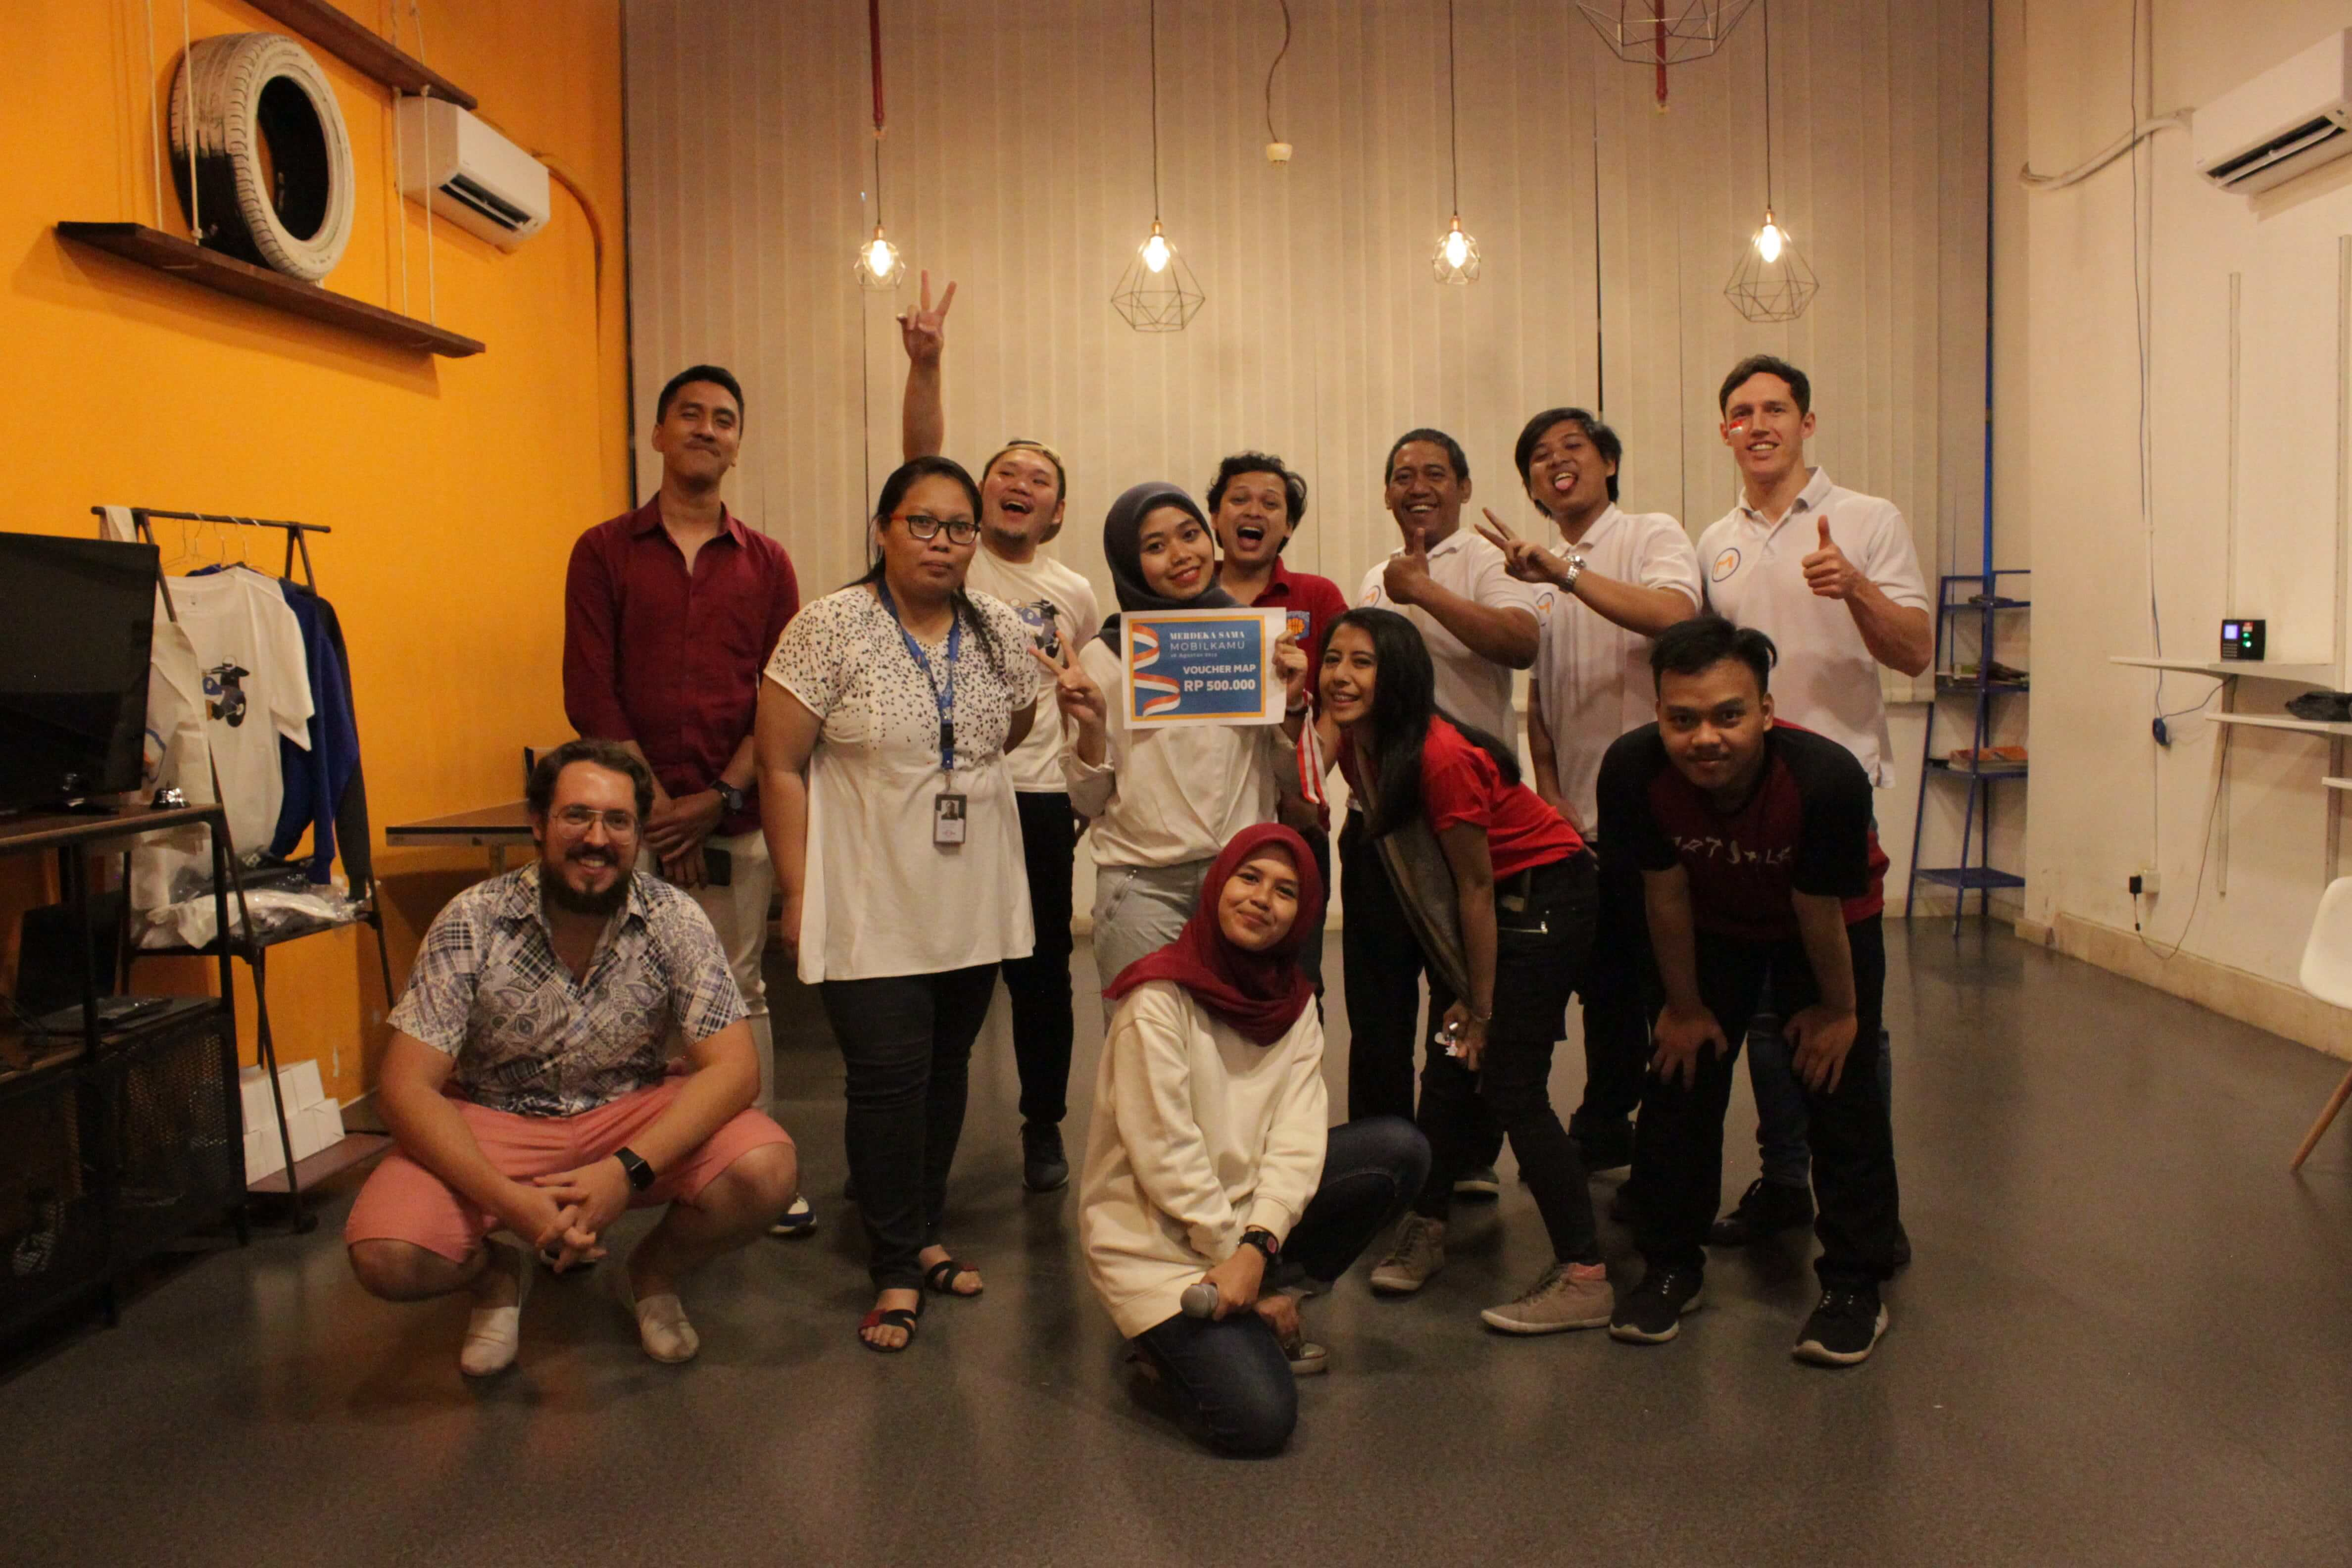 Juara 2-Perayaan Lomba 17 Agustus di Kantor Mobilkamu